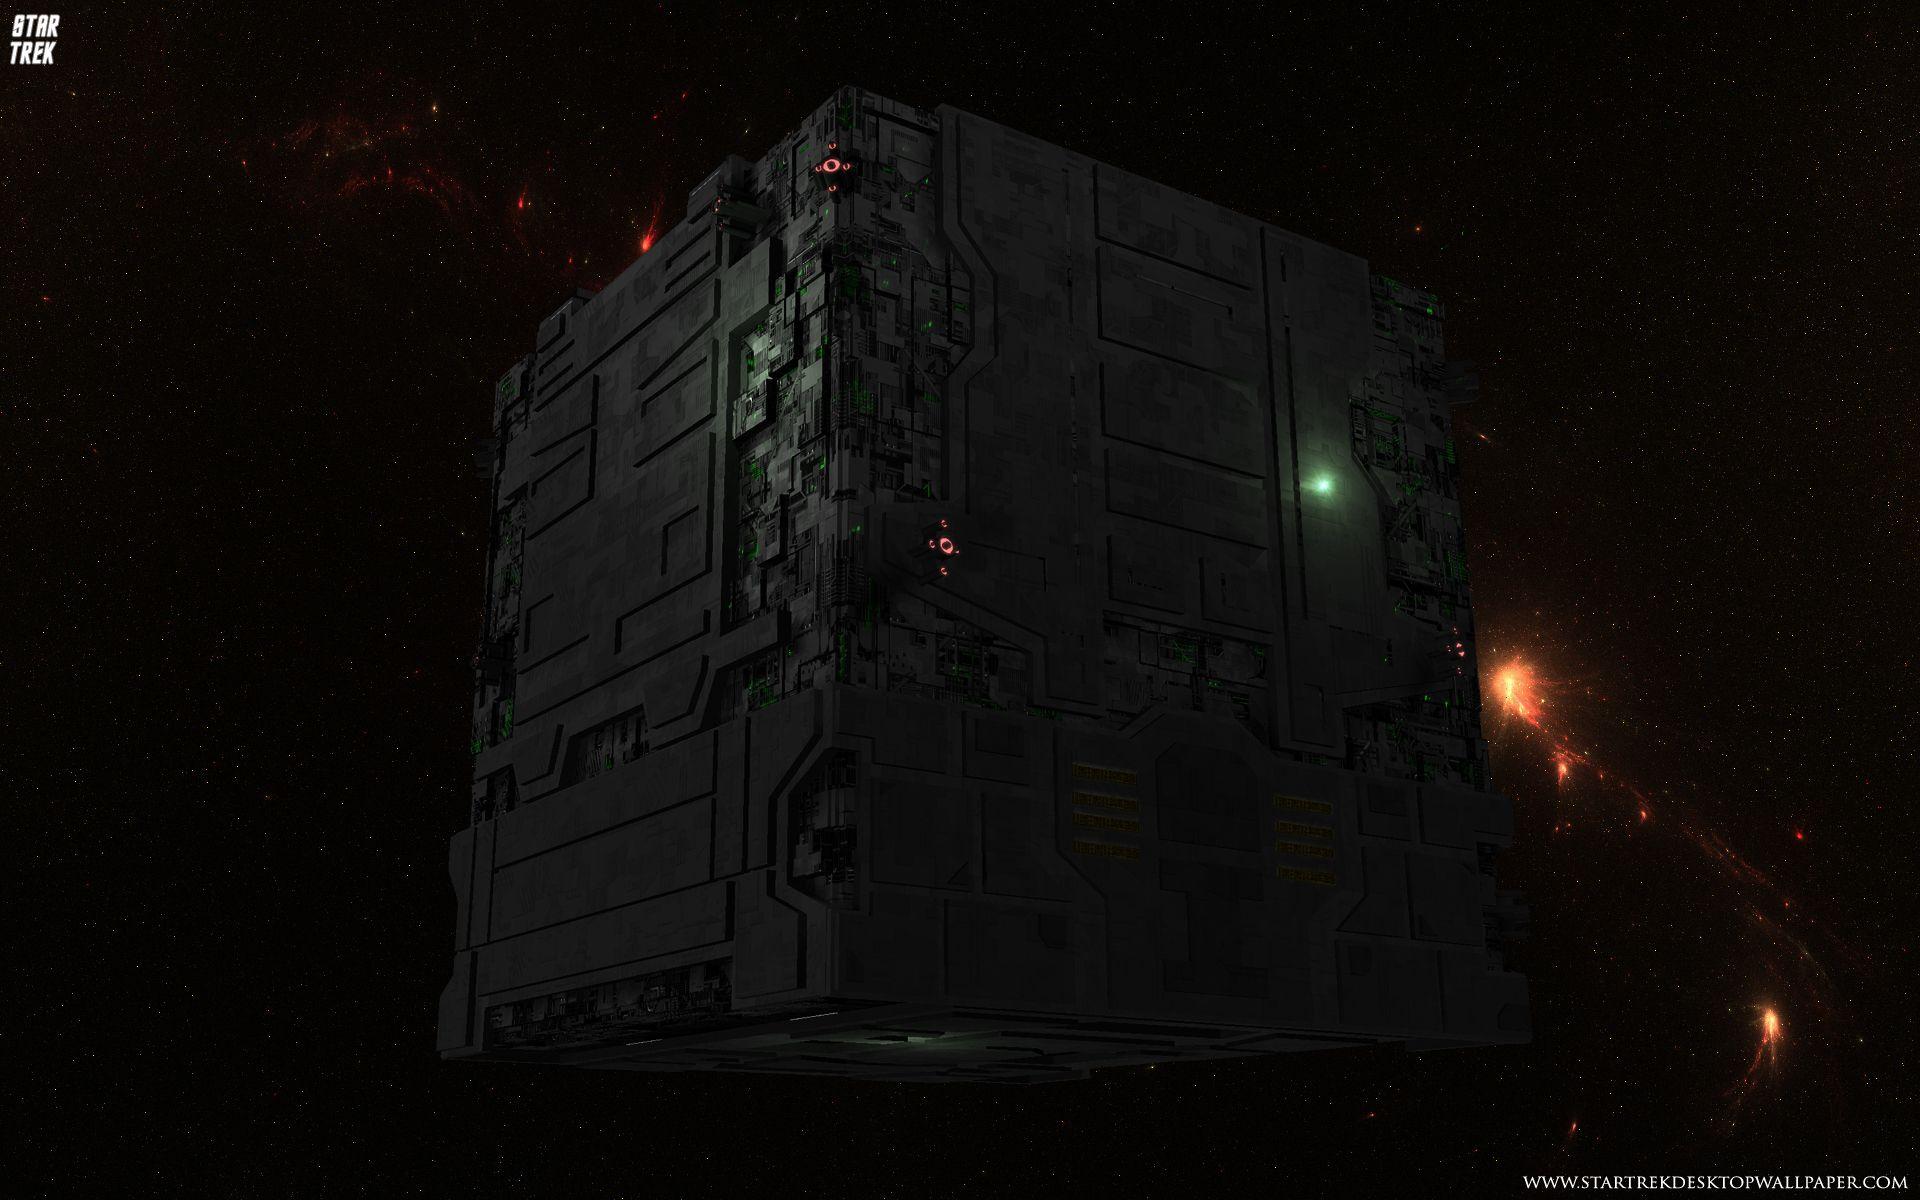 Star Trek Borg Tactical Cube   Star Trek computer desktop 1920x1200